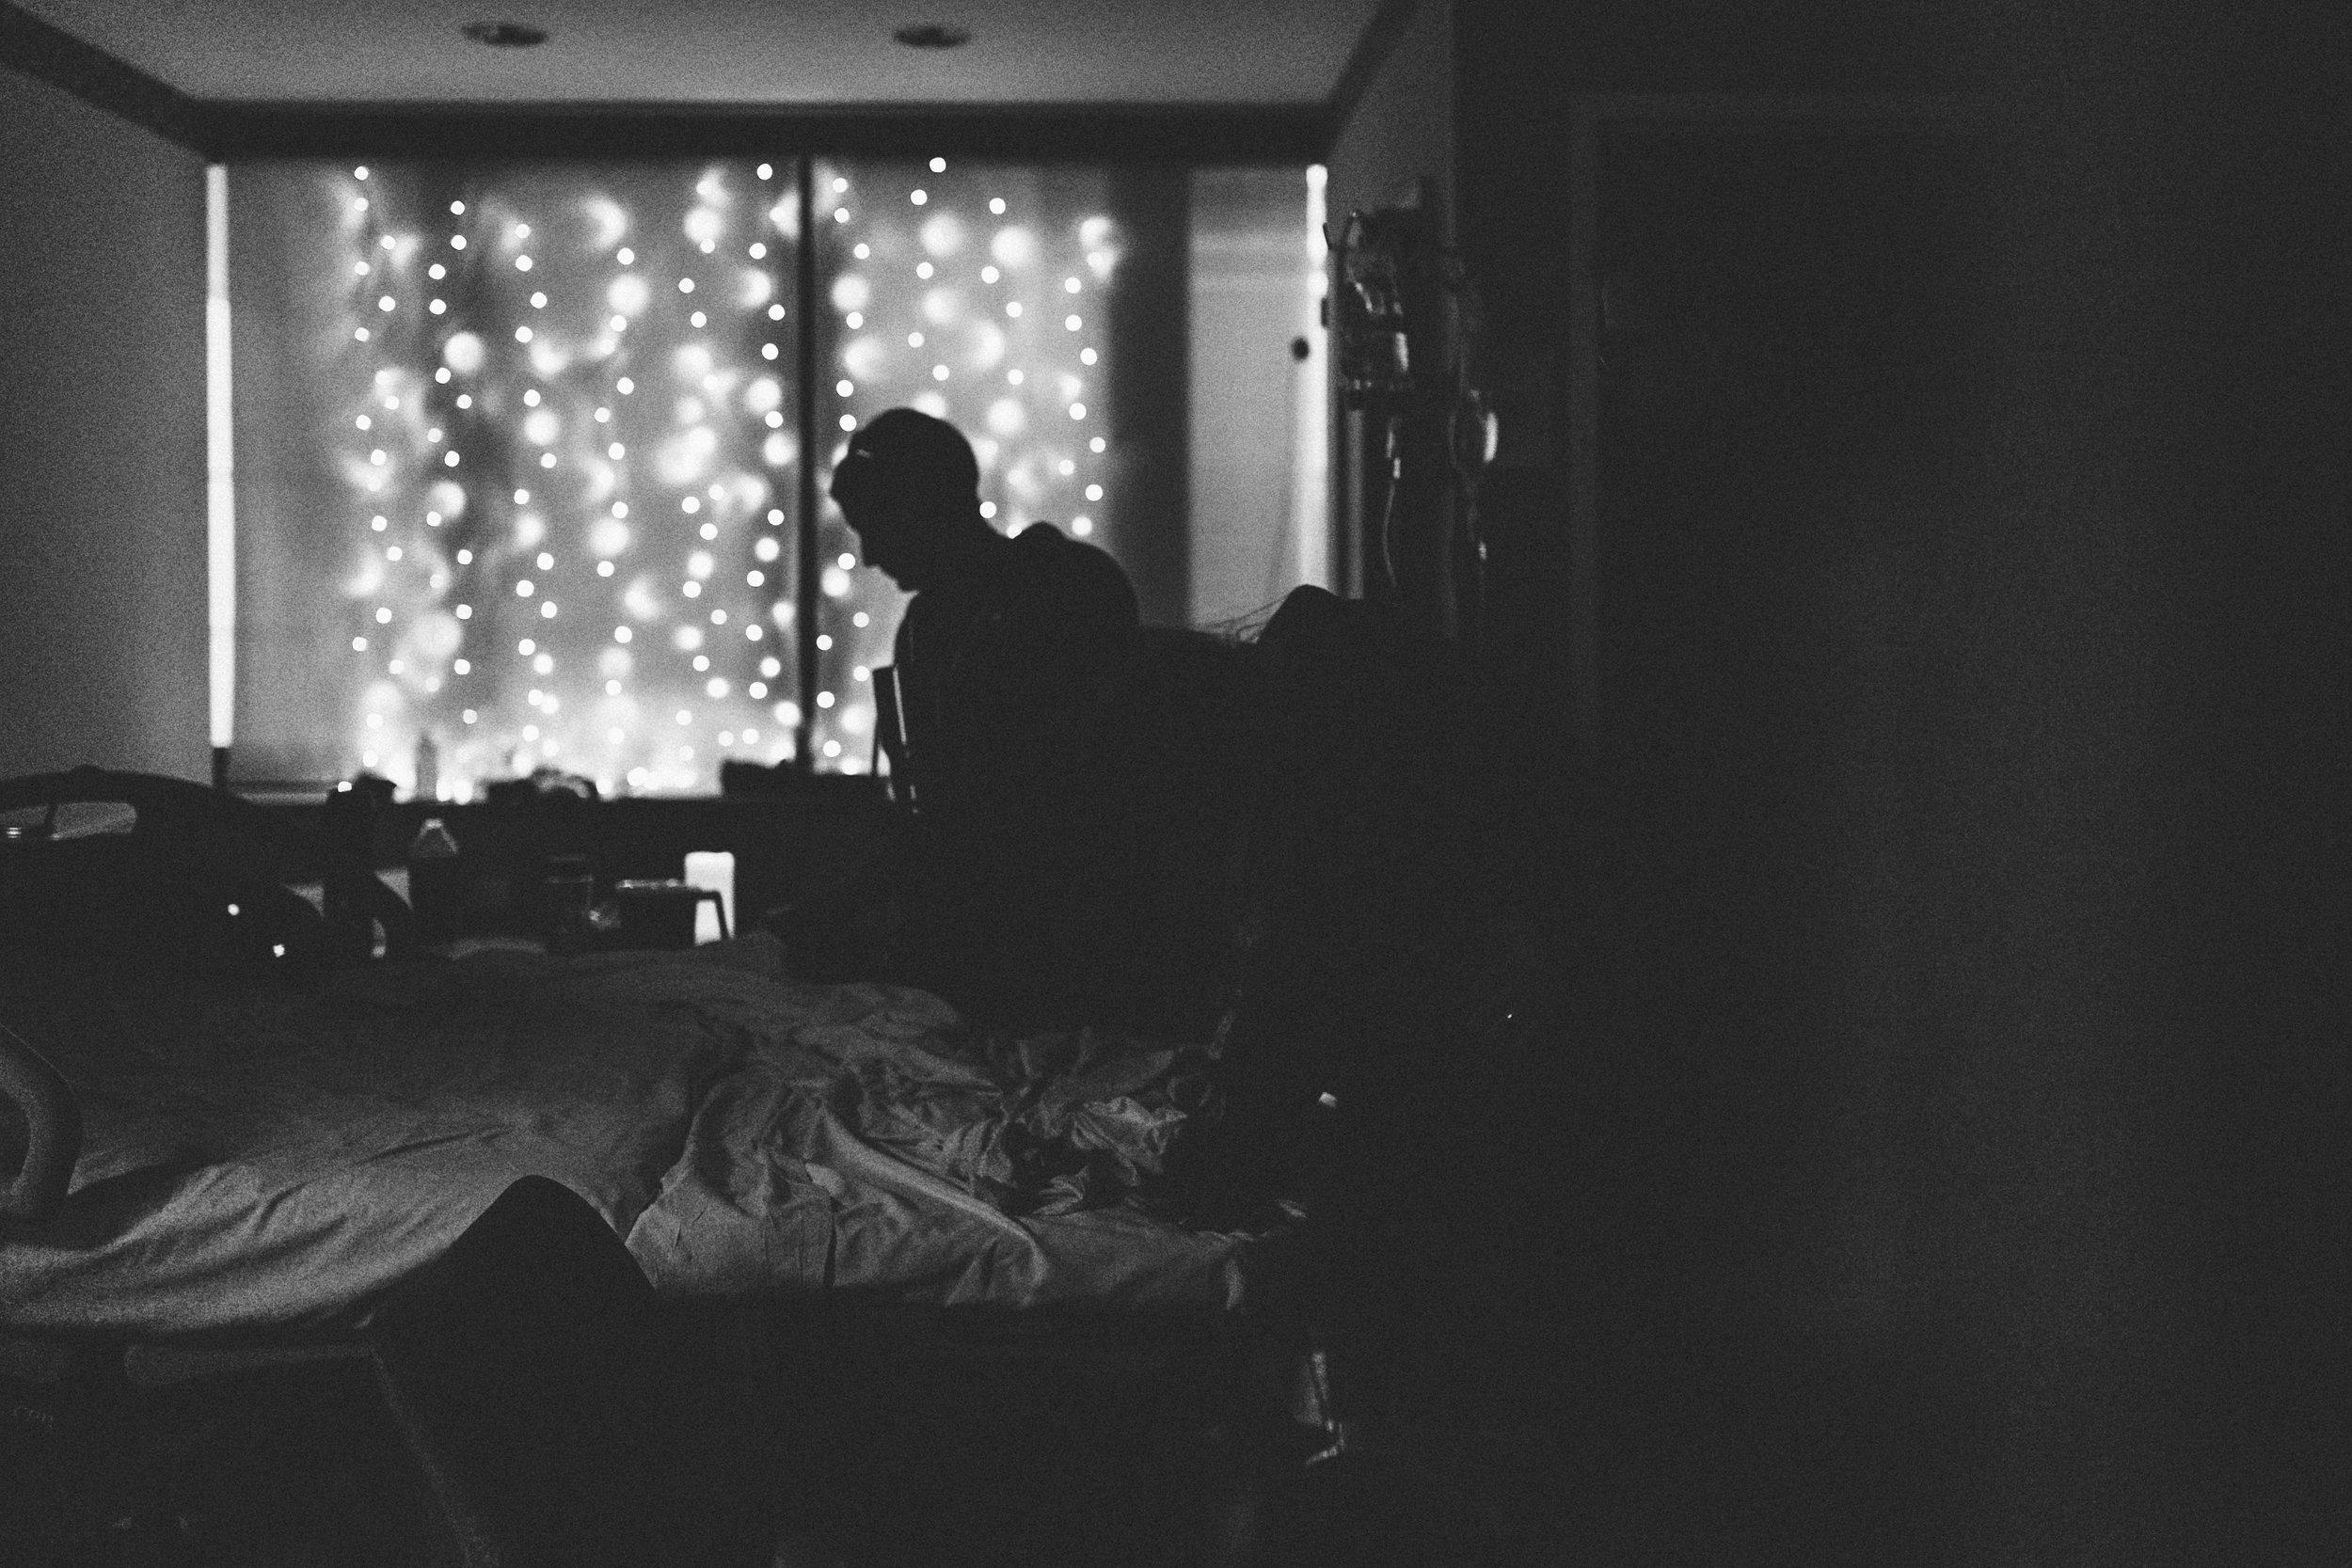 BlackFebruary2018KaileeRichesPhotography-11.jpg